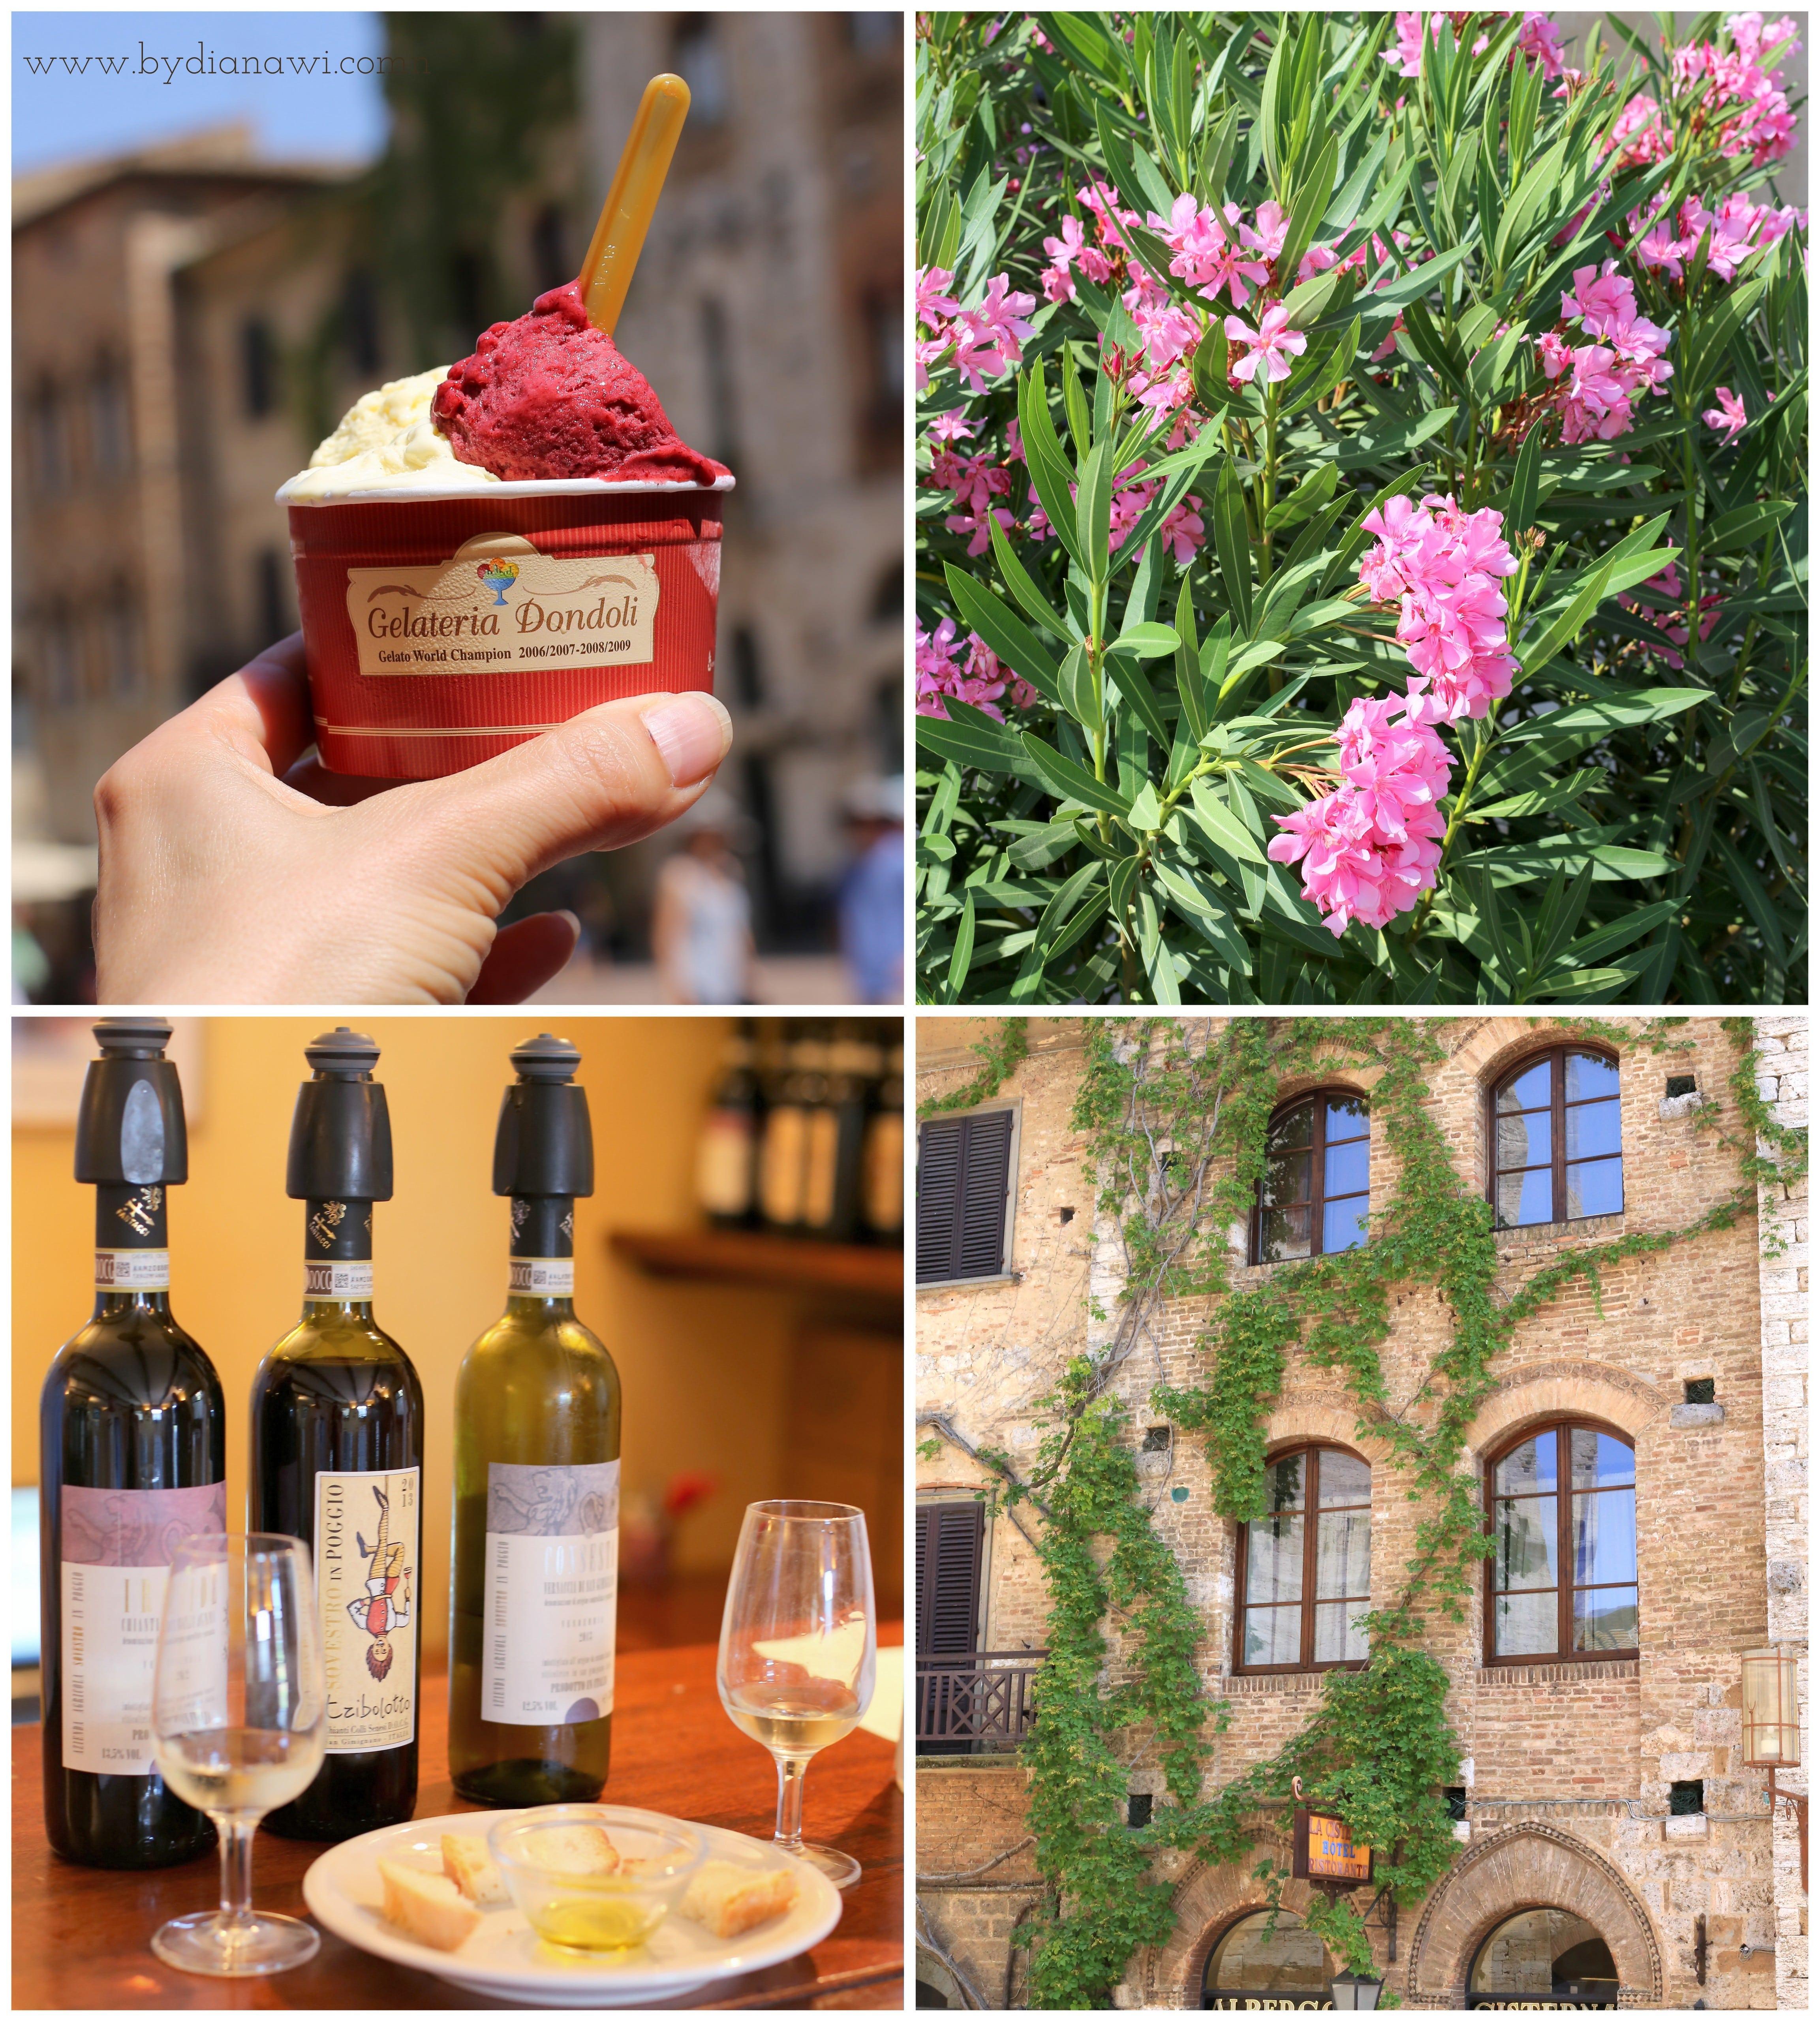 Berømt isbutik i San Gimignano, Toscana